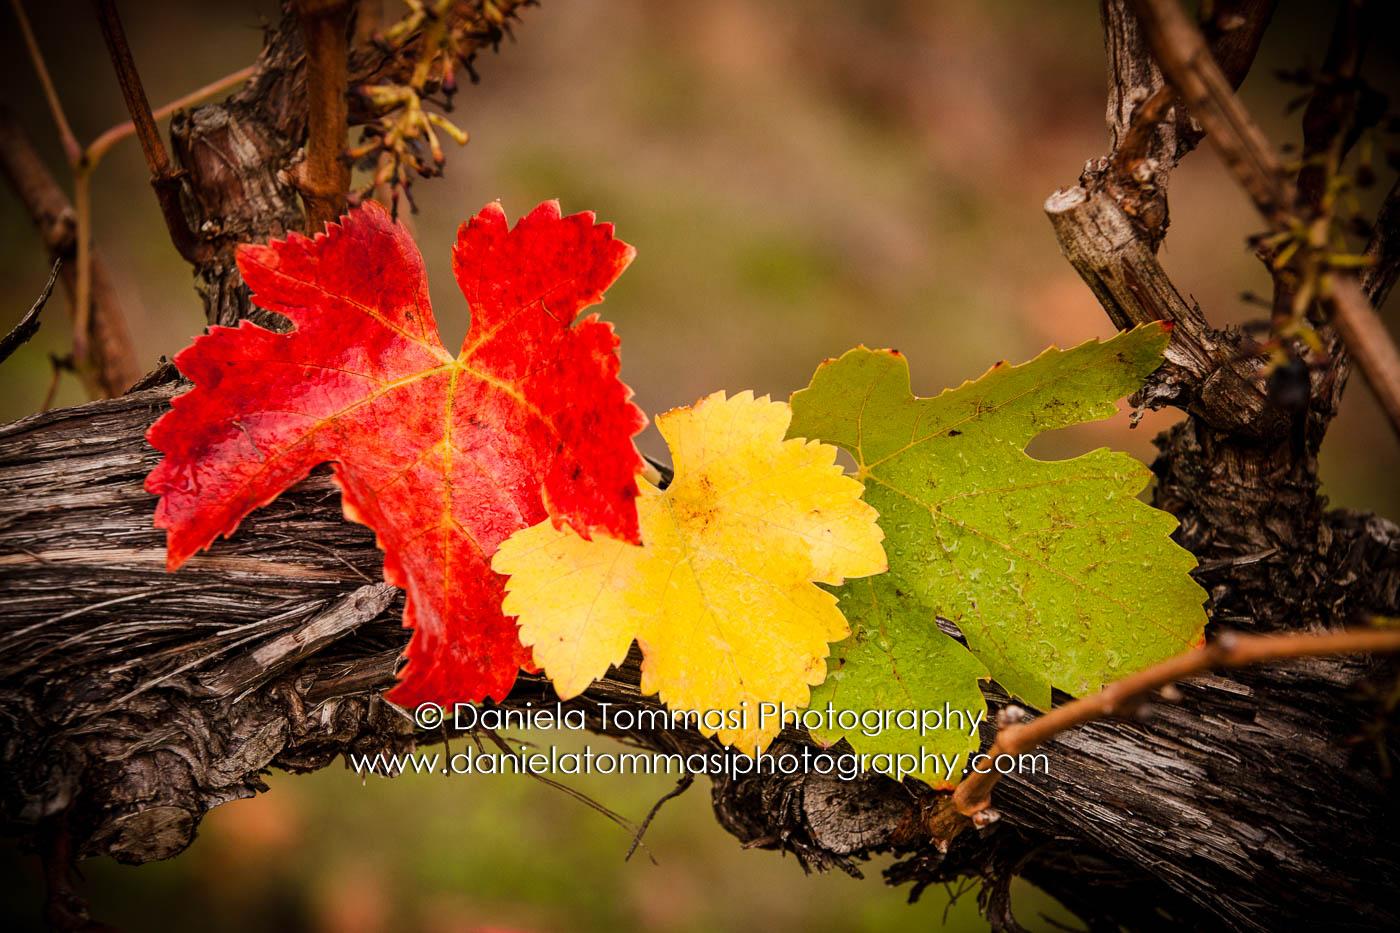 Winery-Daniela Tommasi Photography-9